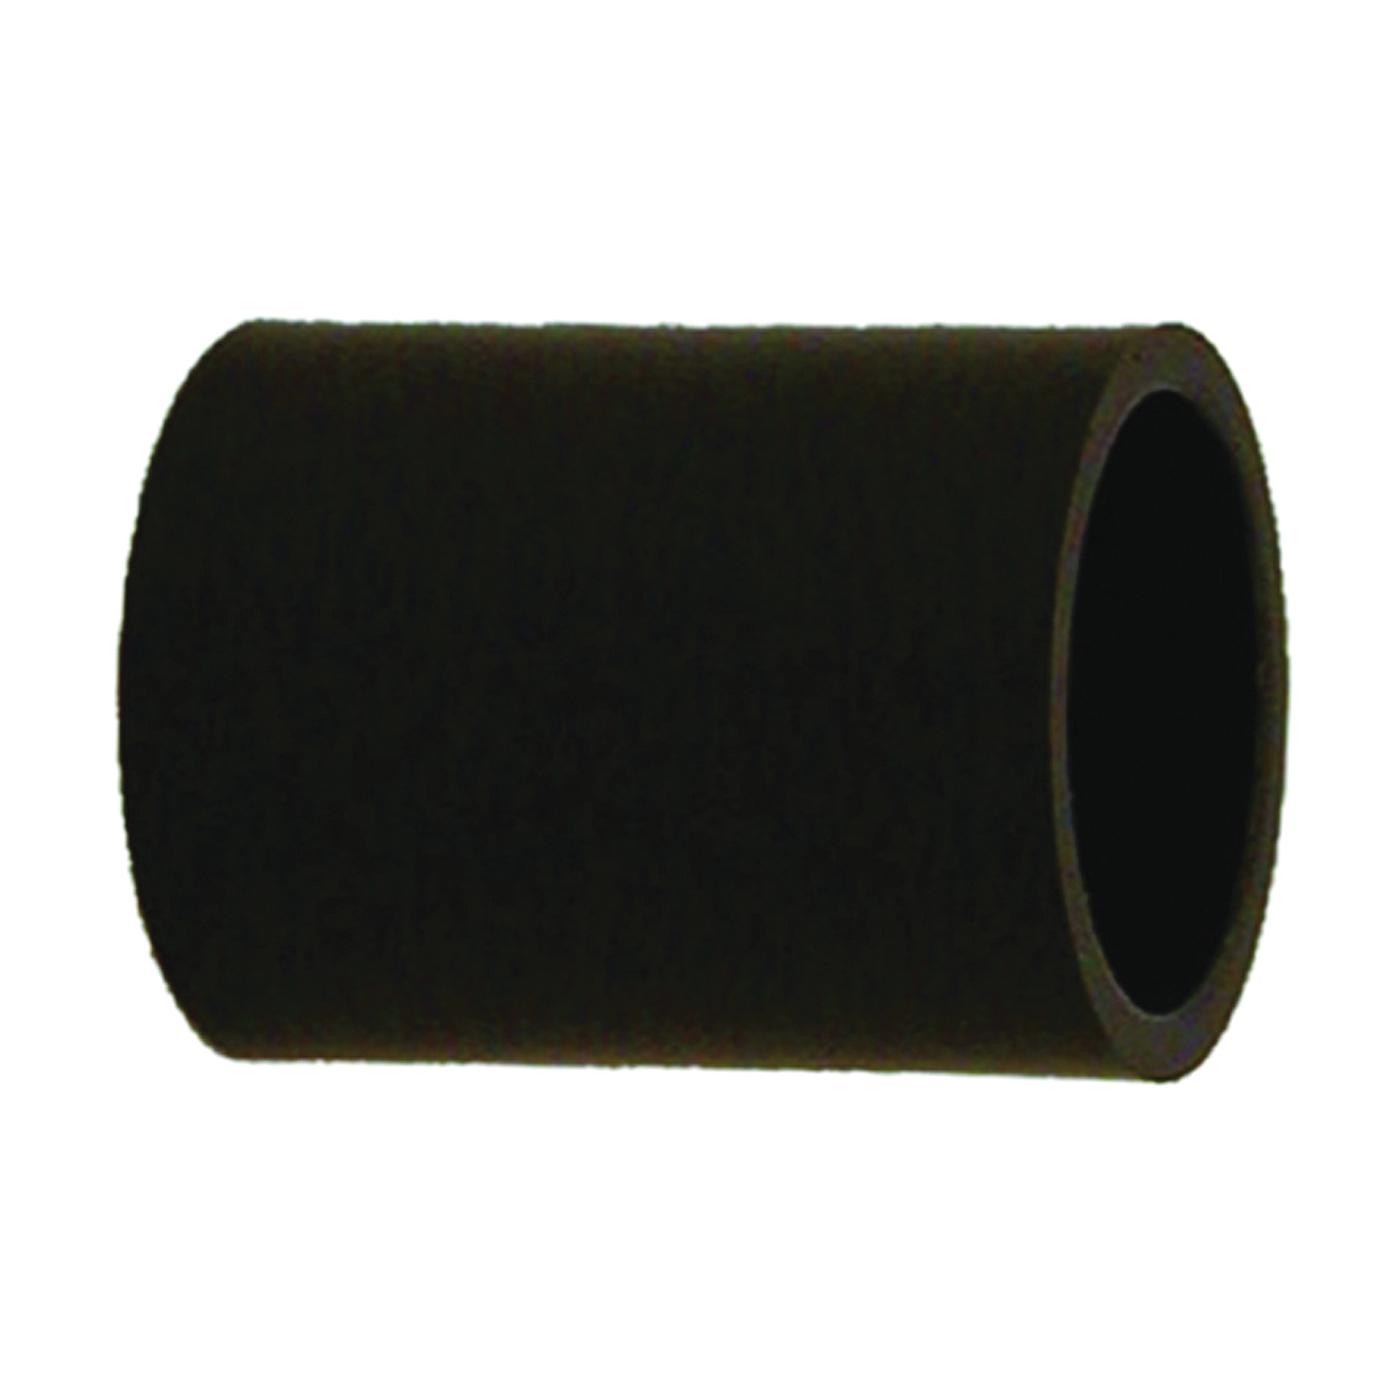 Picture of GENOVA 300 Series 301108 Pipe Coupler, 1 in, Slip Joint, Gray, SCH 80 Schedule, 630 psi Pressure